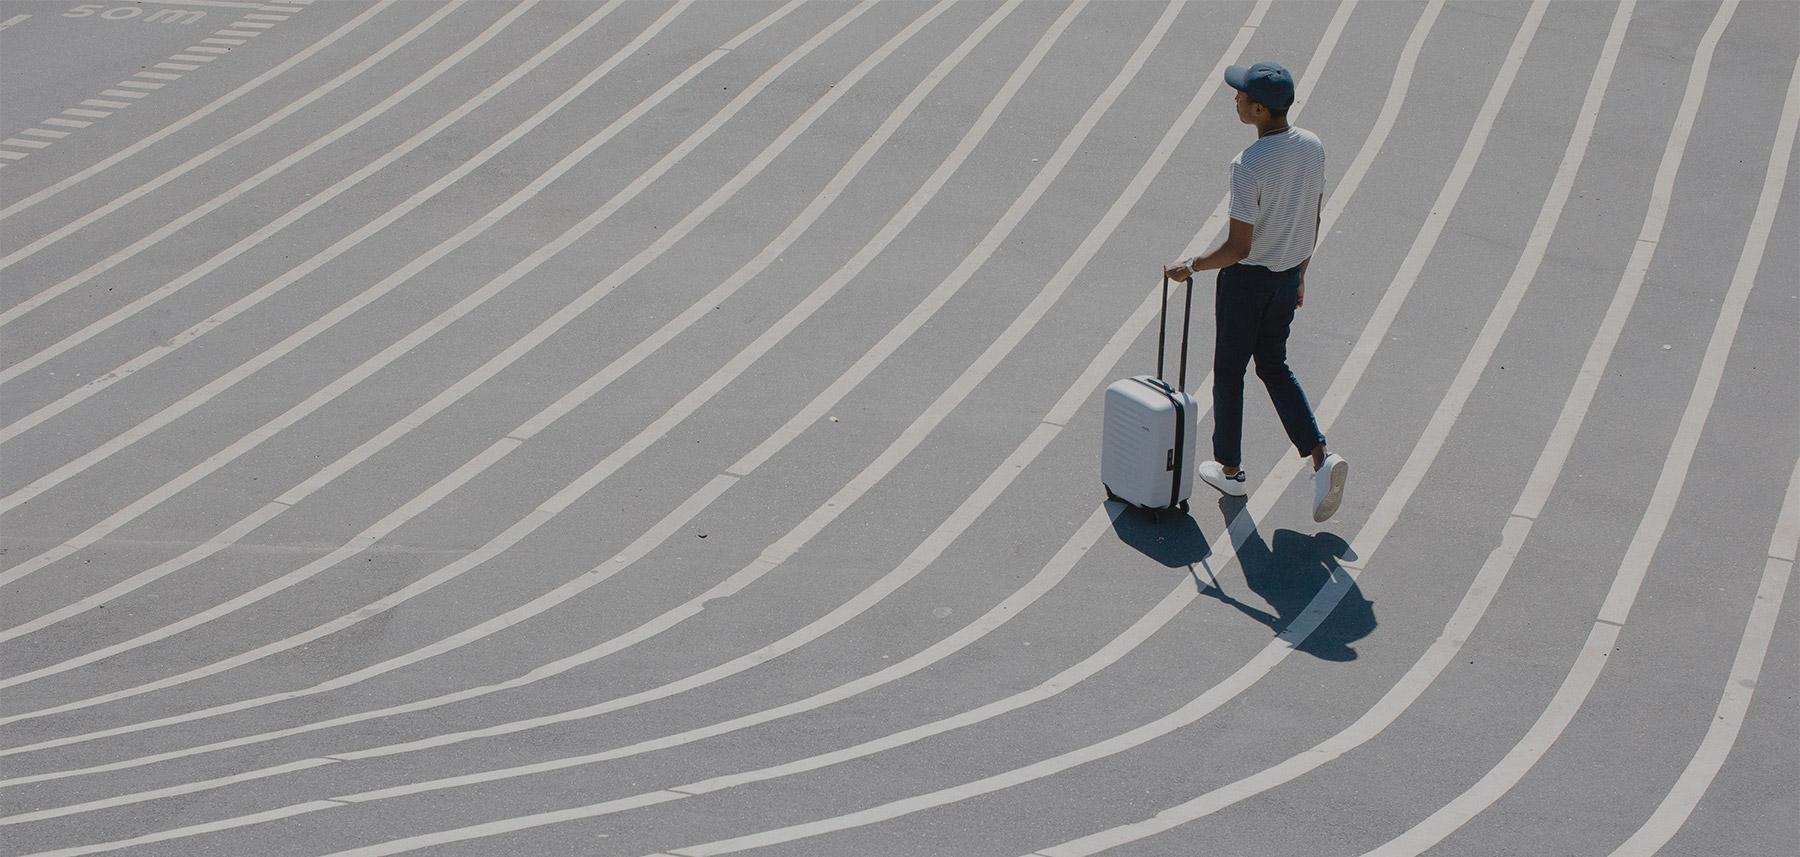 Luggage | LOJEL - Let Our Journeys Enrich Life